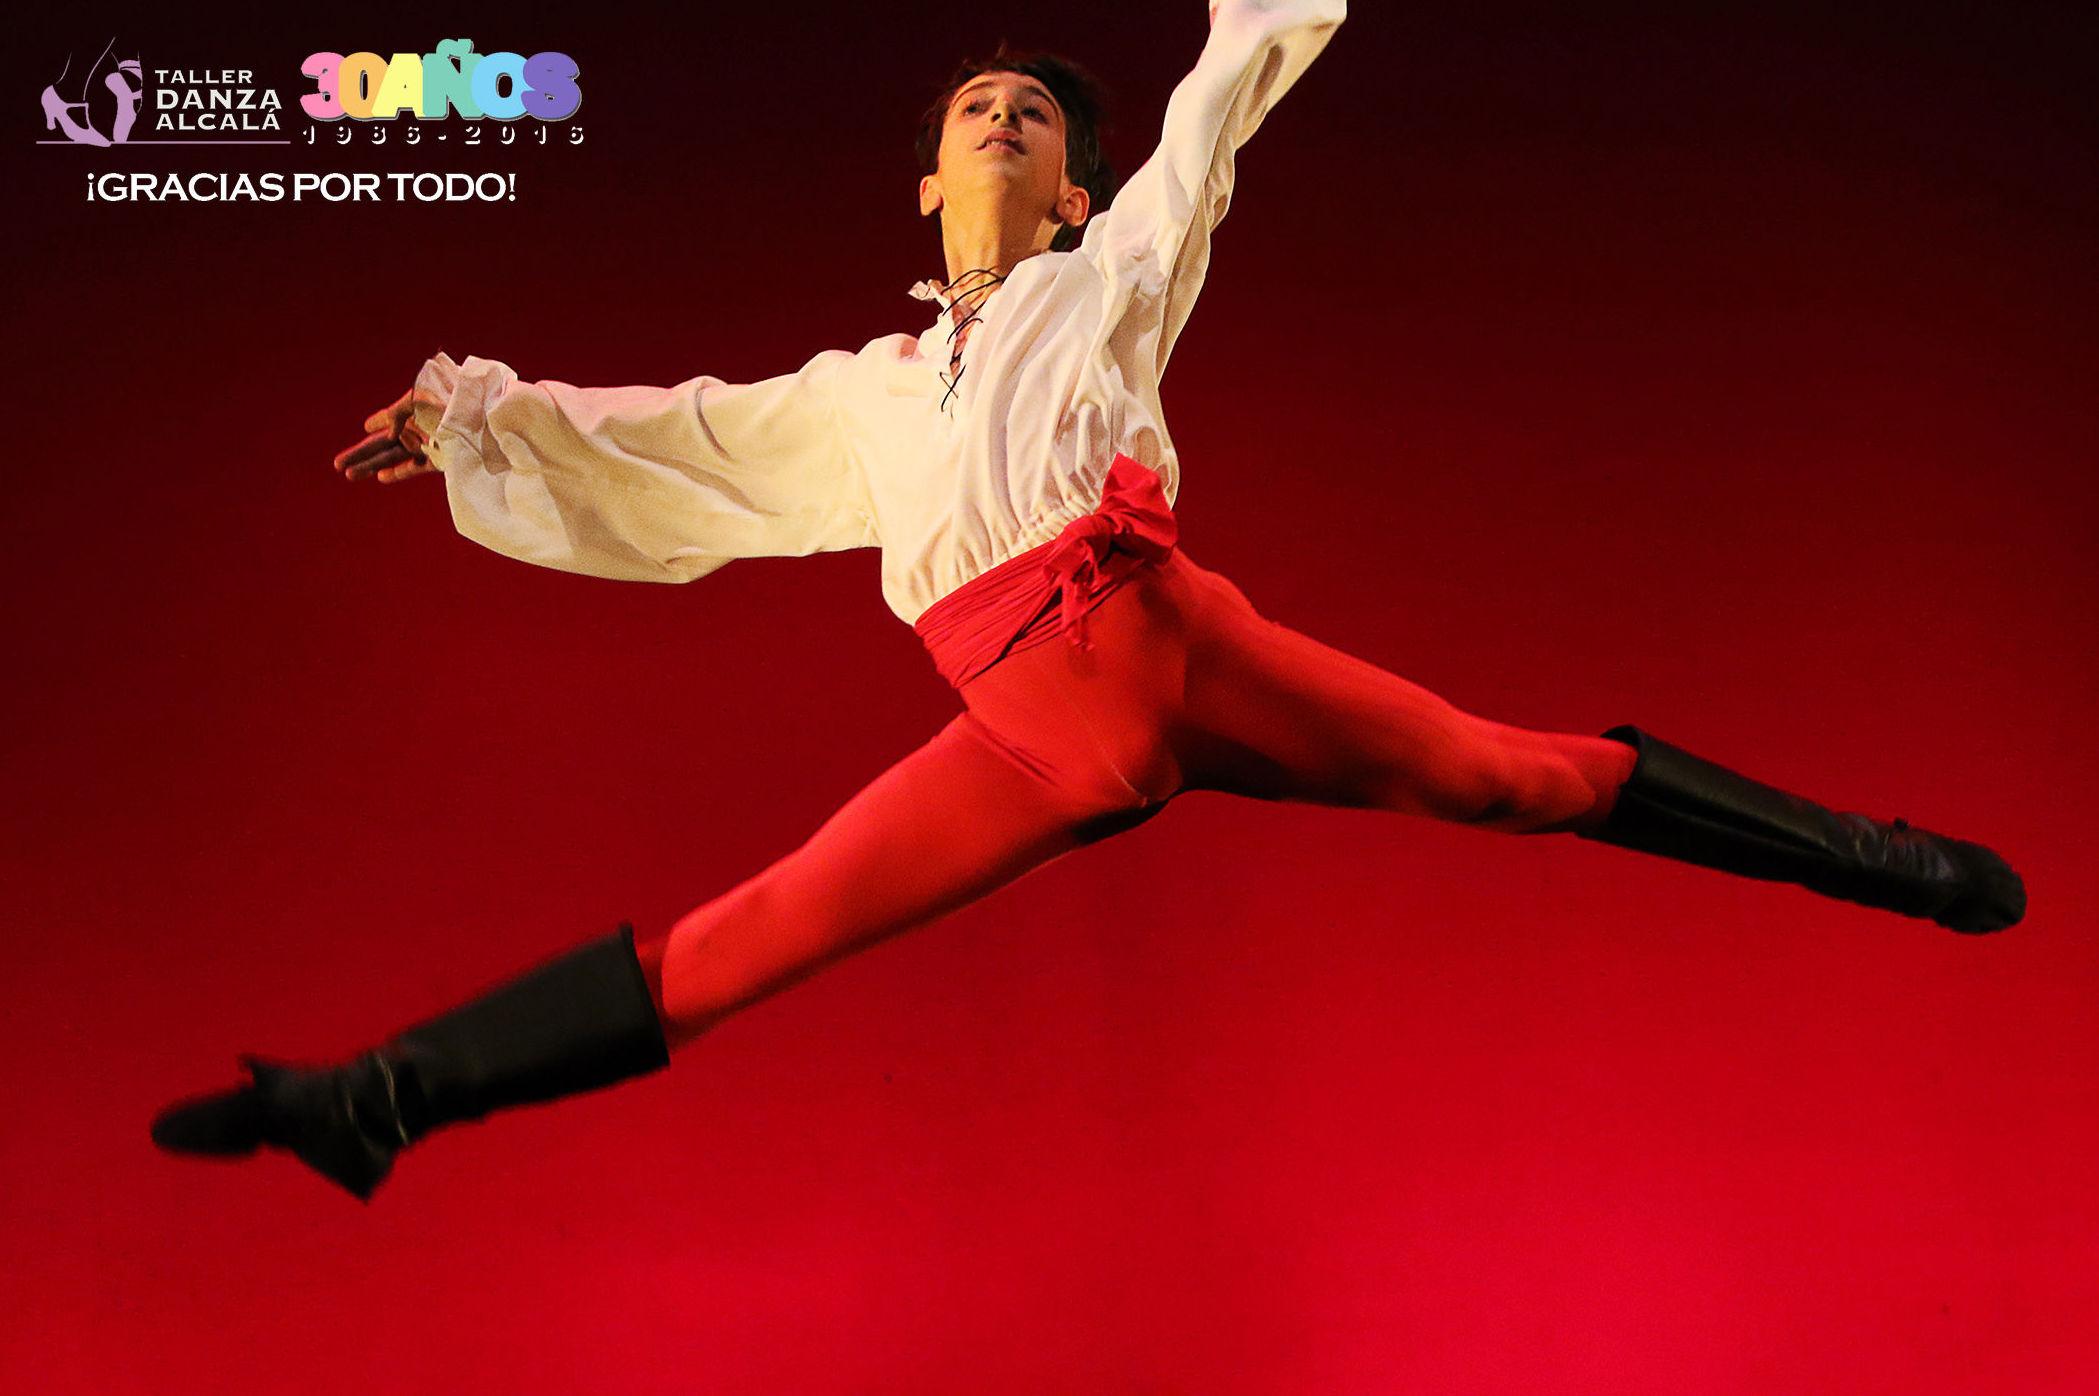 Danza clásica en Alcalá de Henares